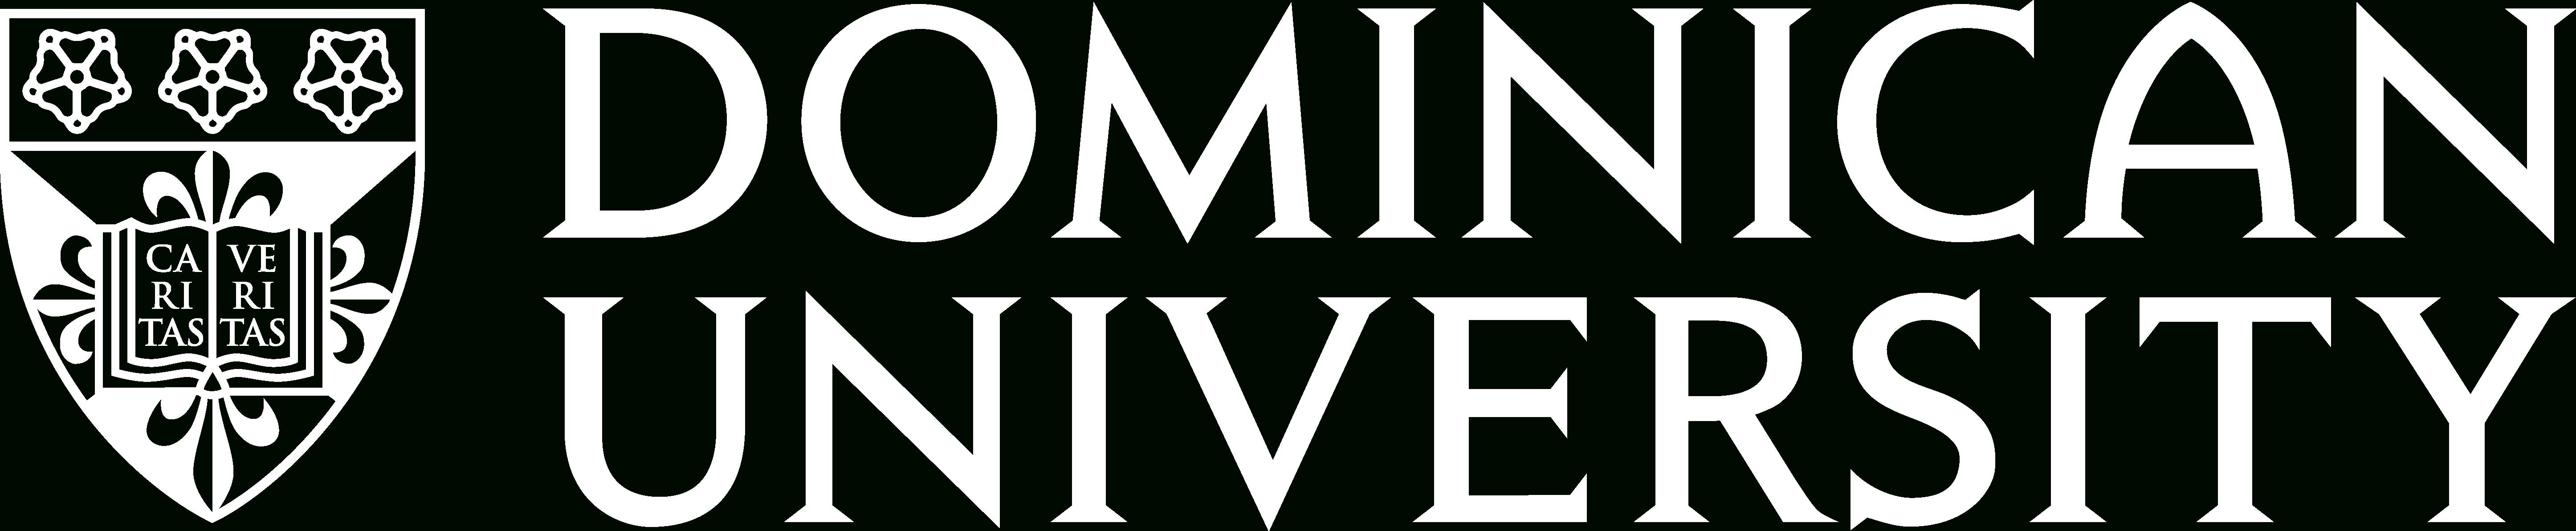 Academic Calendar | Registrar's Office | Mydu intended for Spring 2021 Academic Calander For Old Dominion University